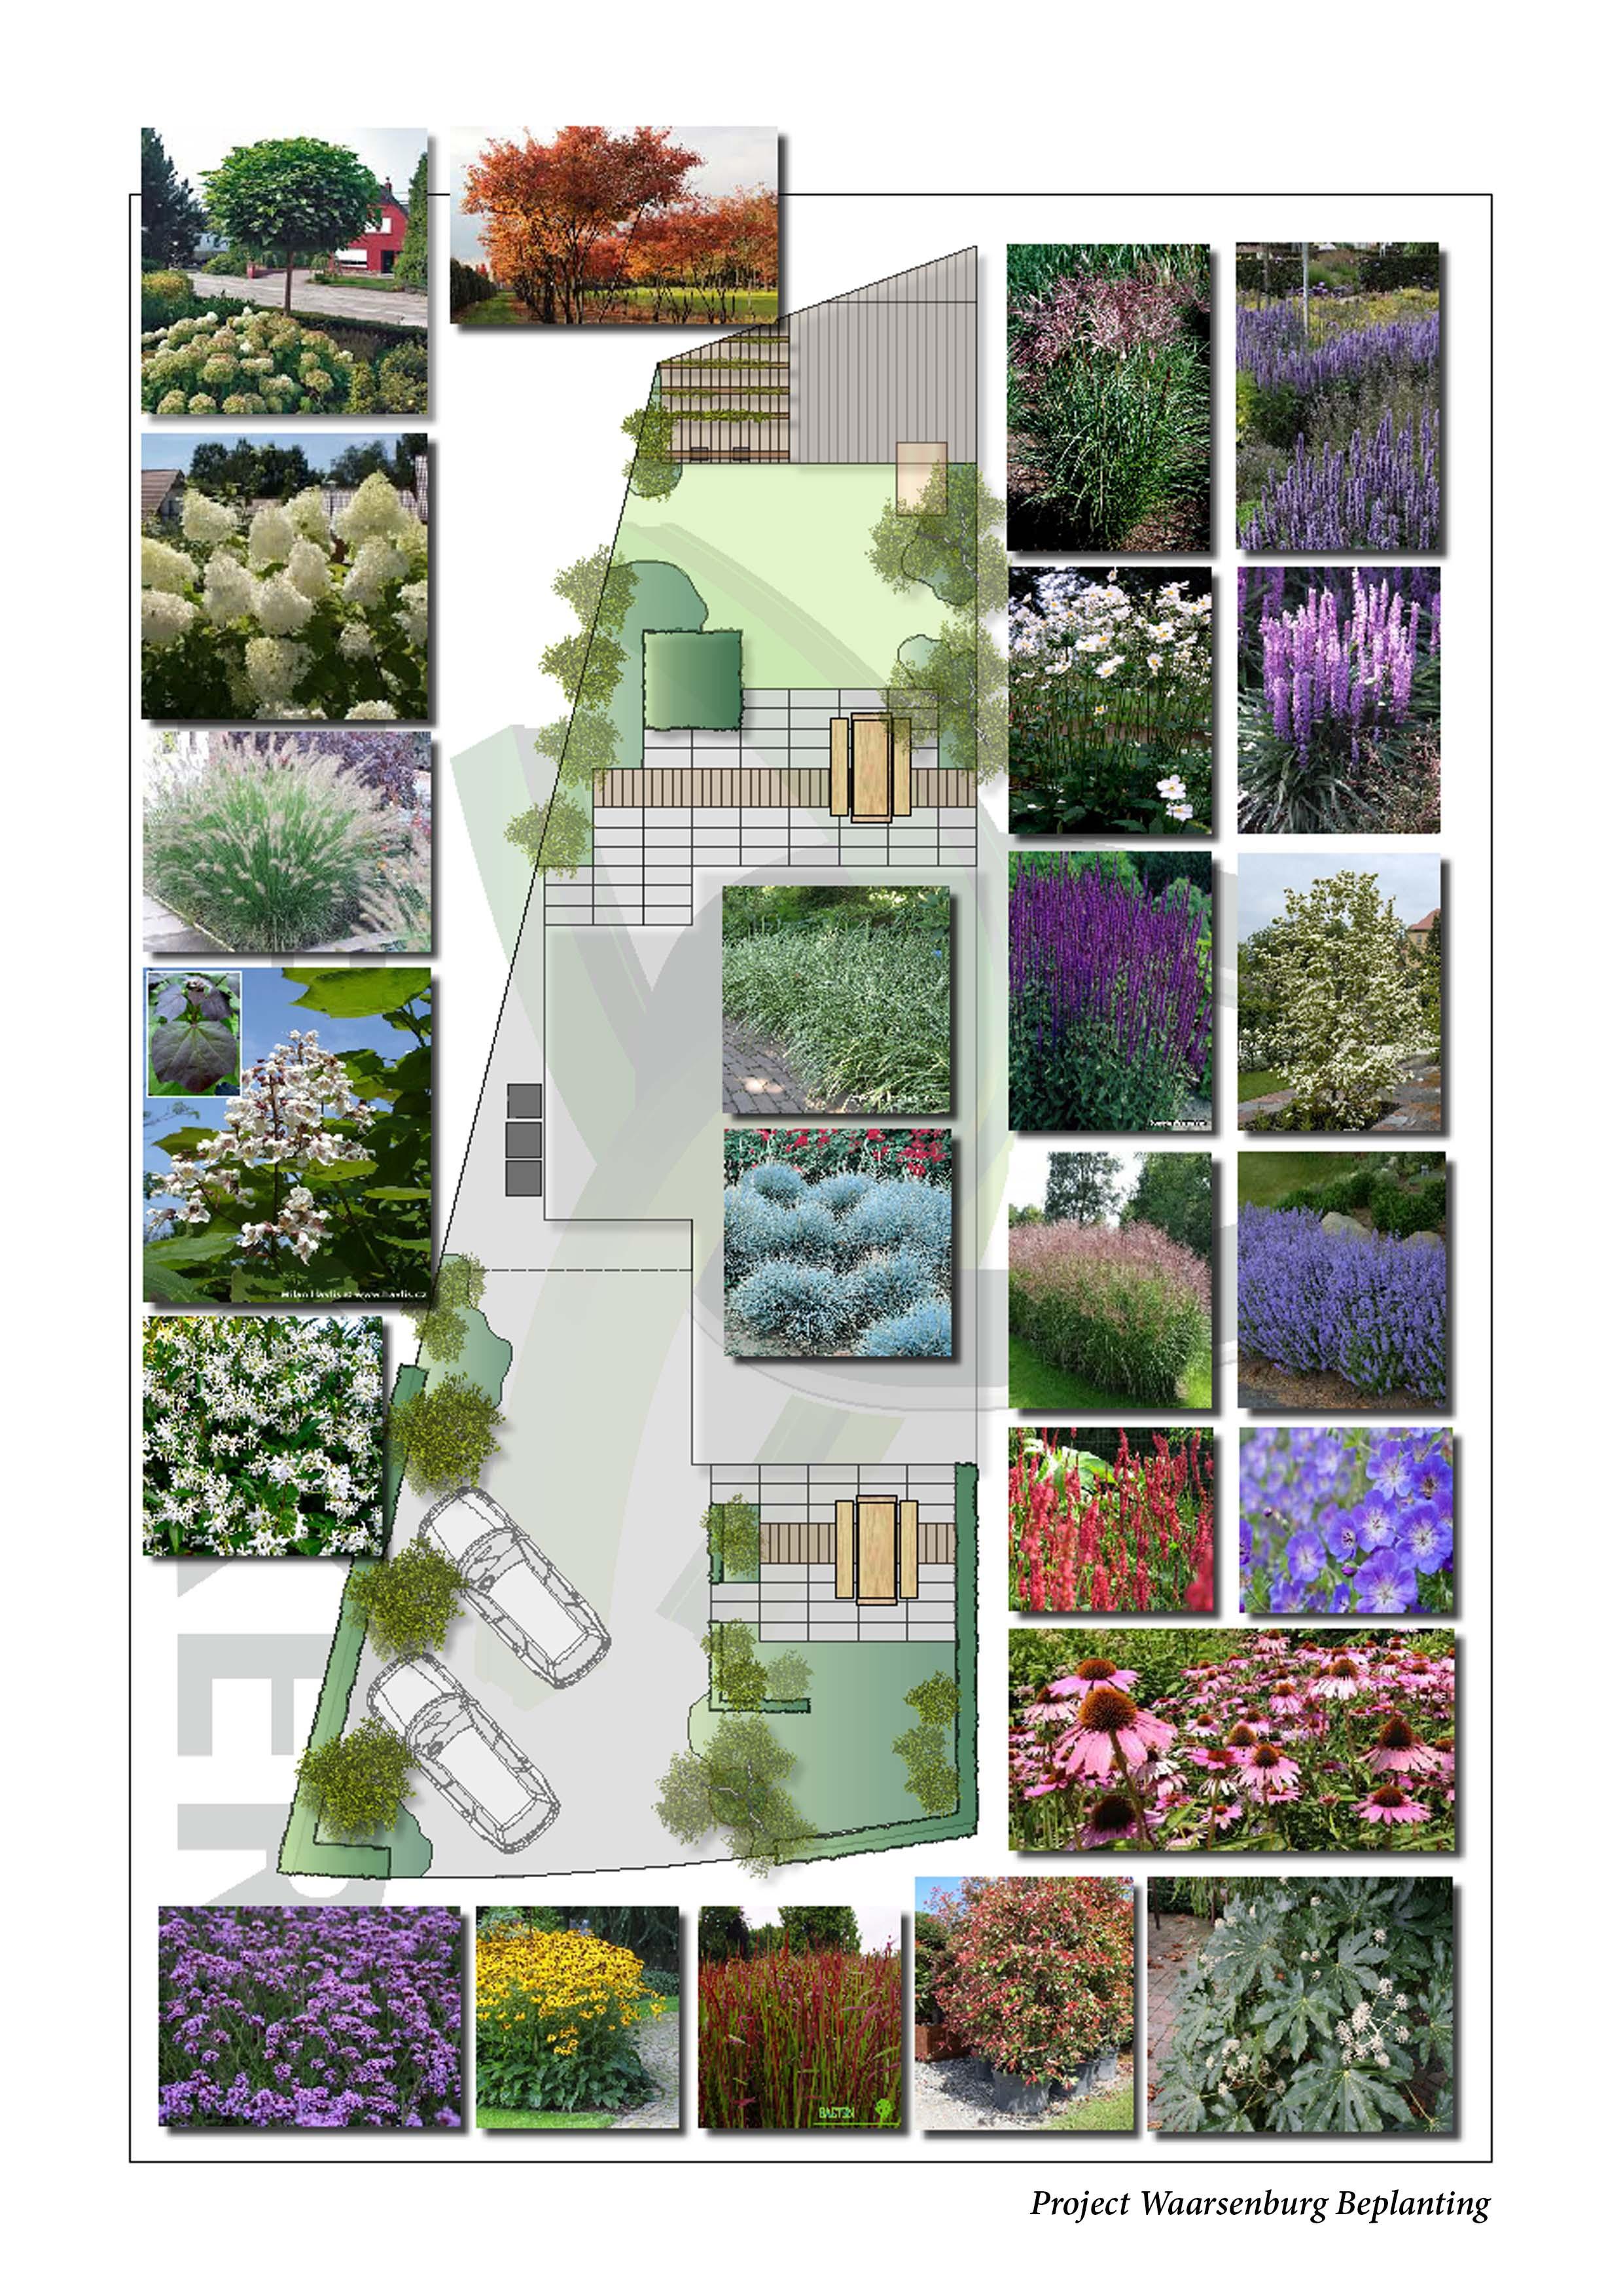 Hoefakker Hoveniers Project Waarsenburg beplanting